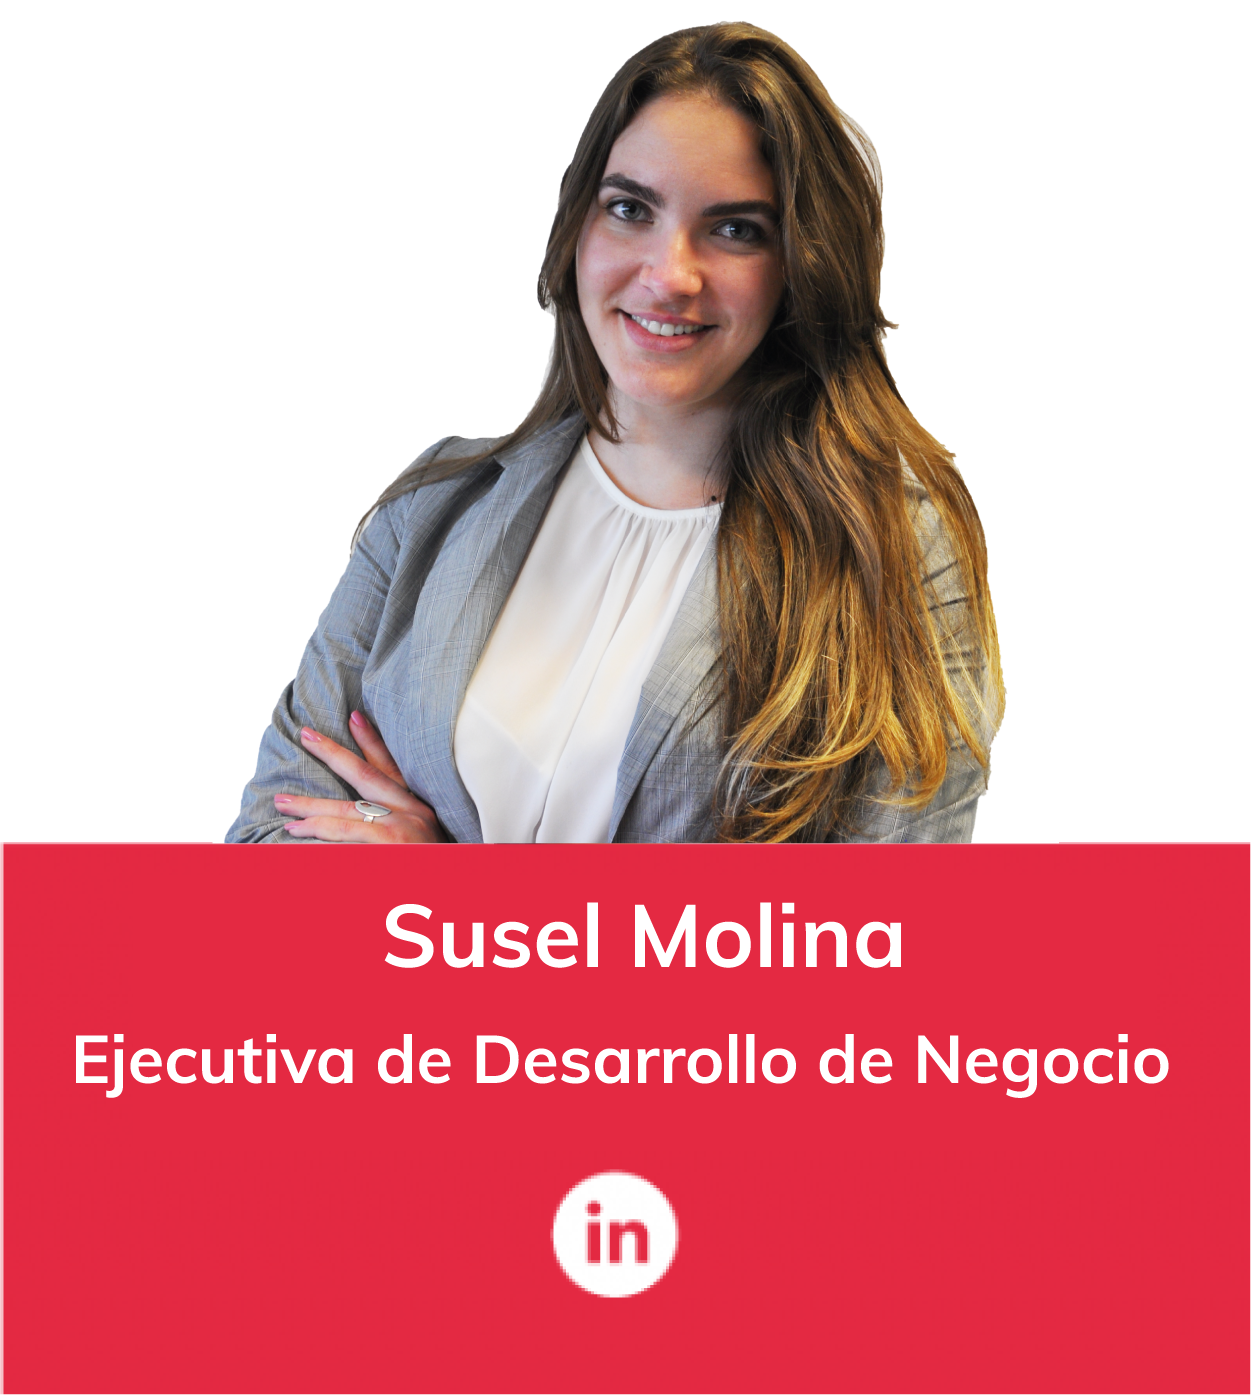 Susel Molina